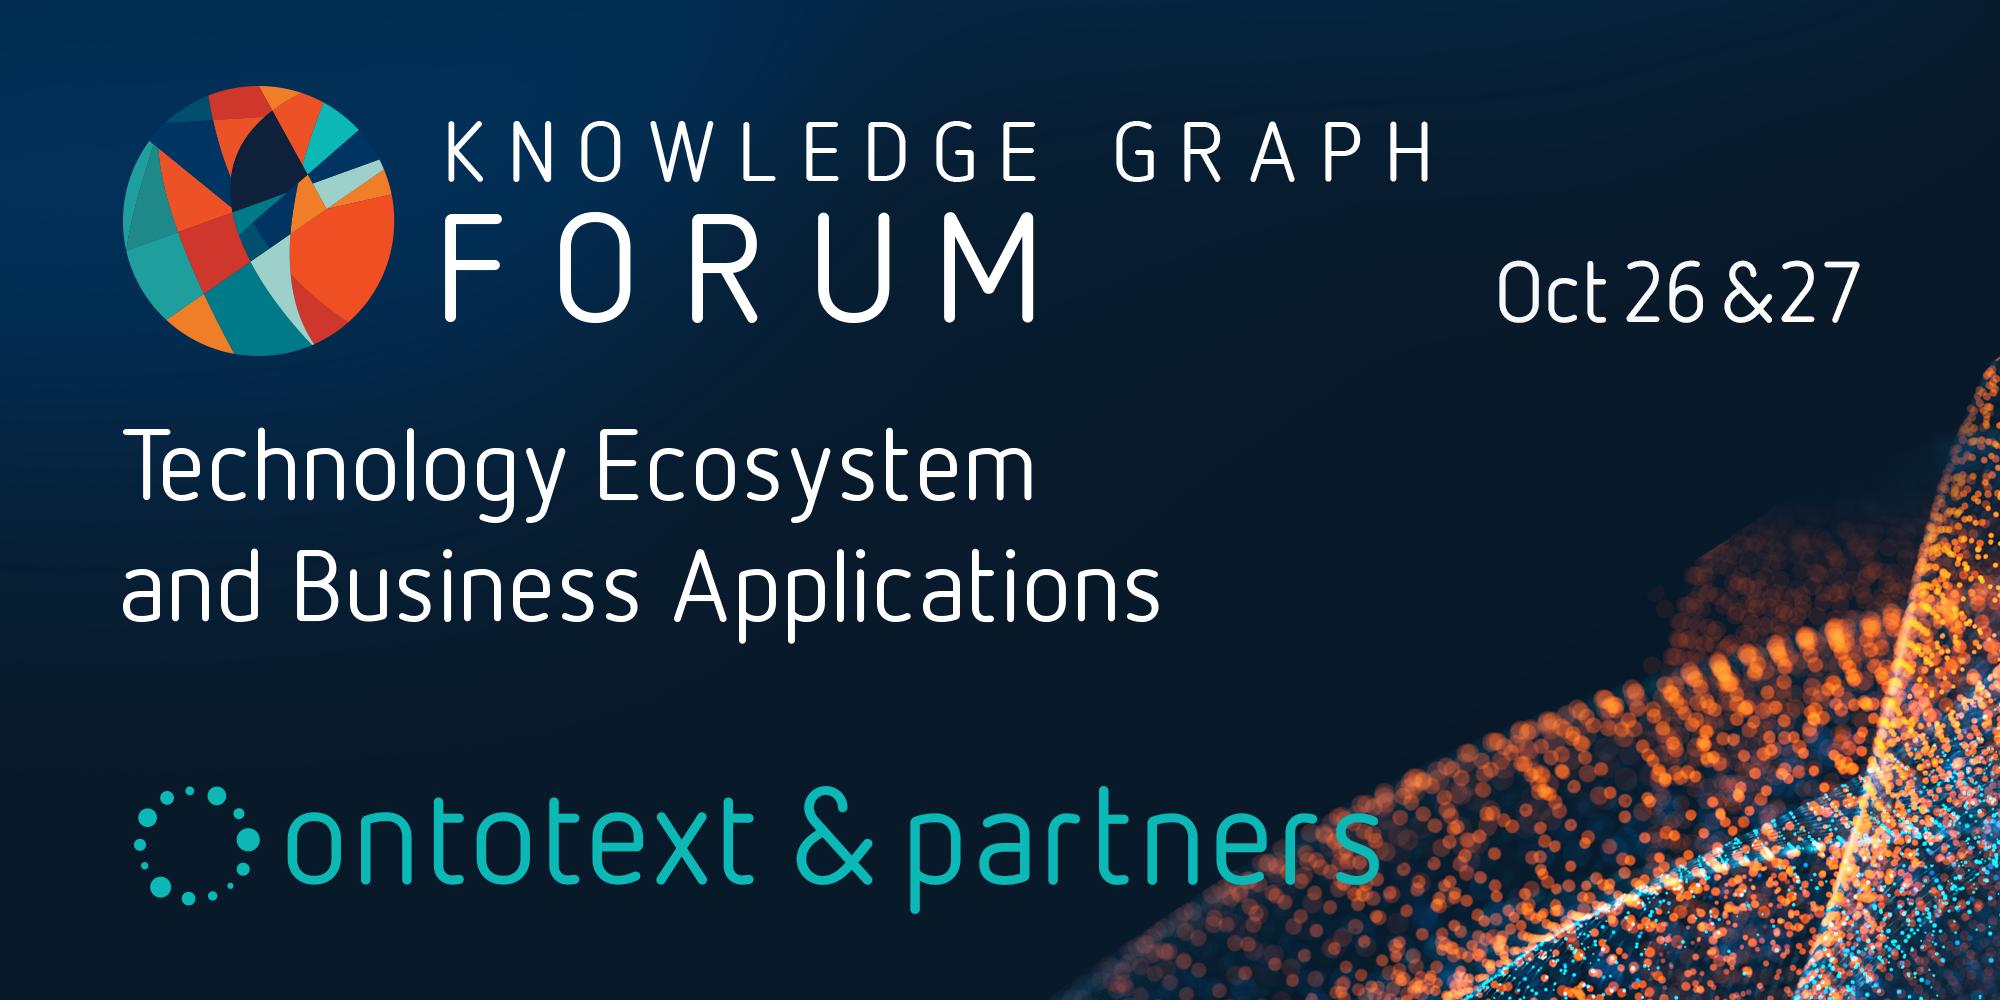 Knowledge Graph Forum